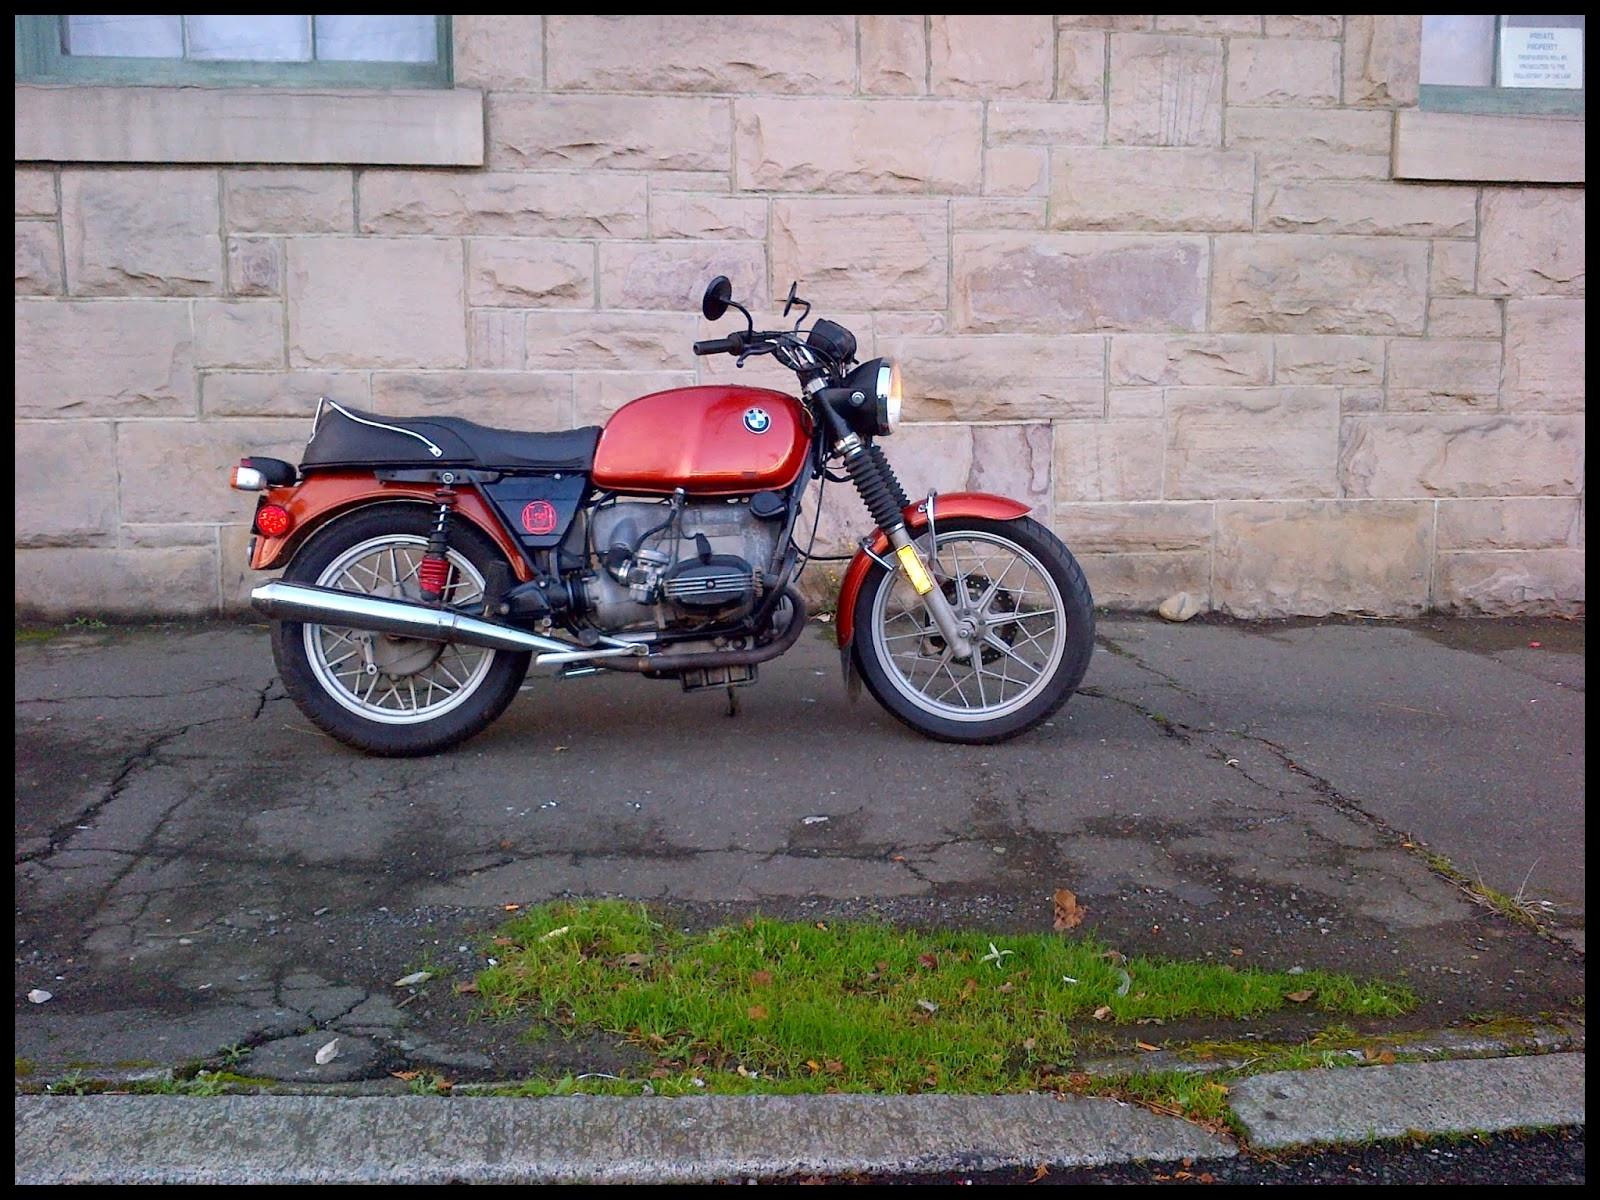 Bmw R100 7t Near Seattle Soviet Steeds Full Hd Wallpaper Bmw R100